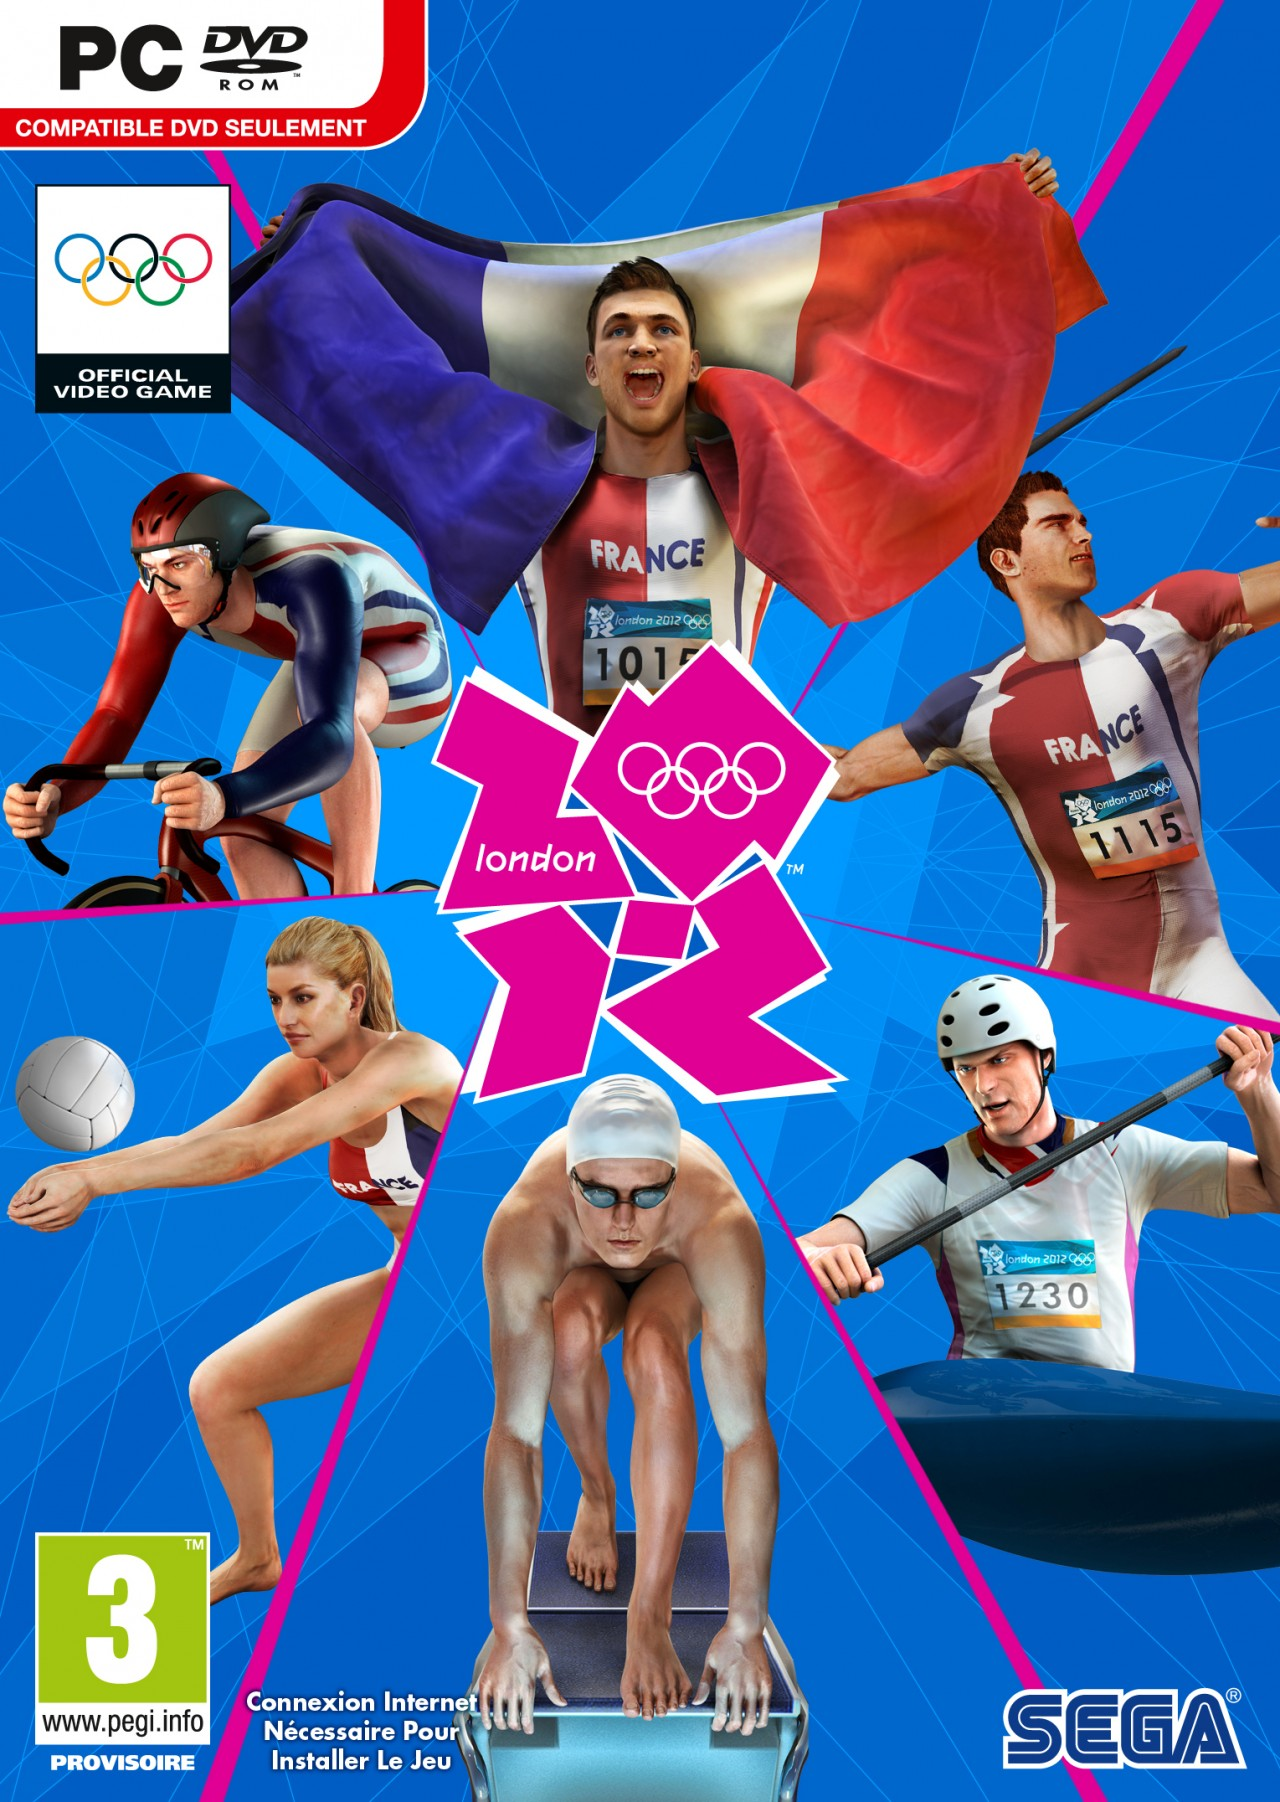 londres 2012 le jeu vid o officiel des jeux olympiques. Black Bedroom Furniture Sets. Home Design Ideas